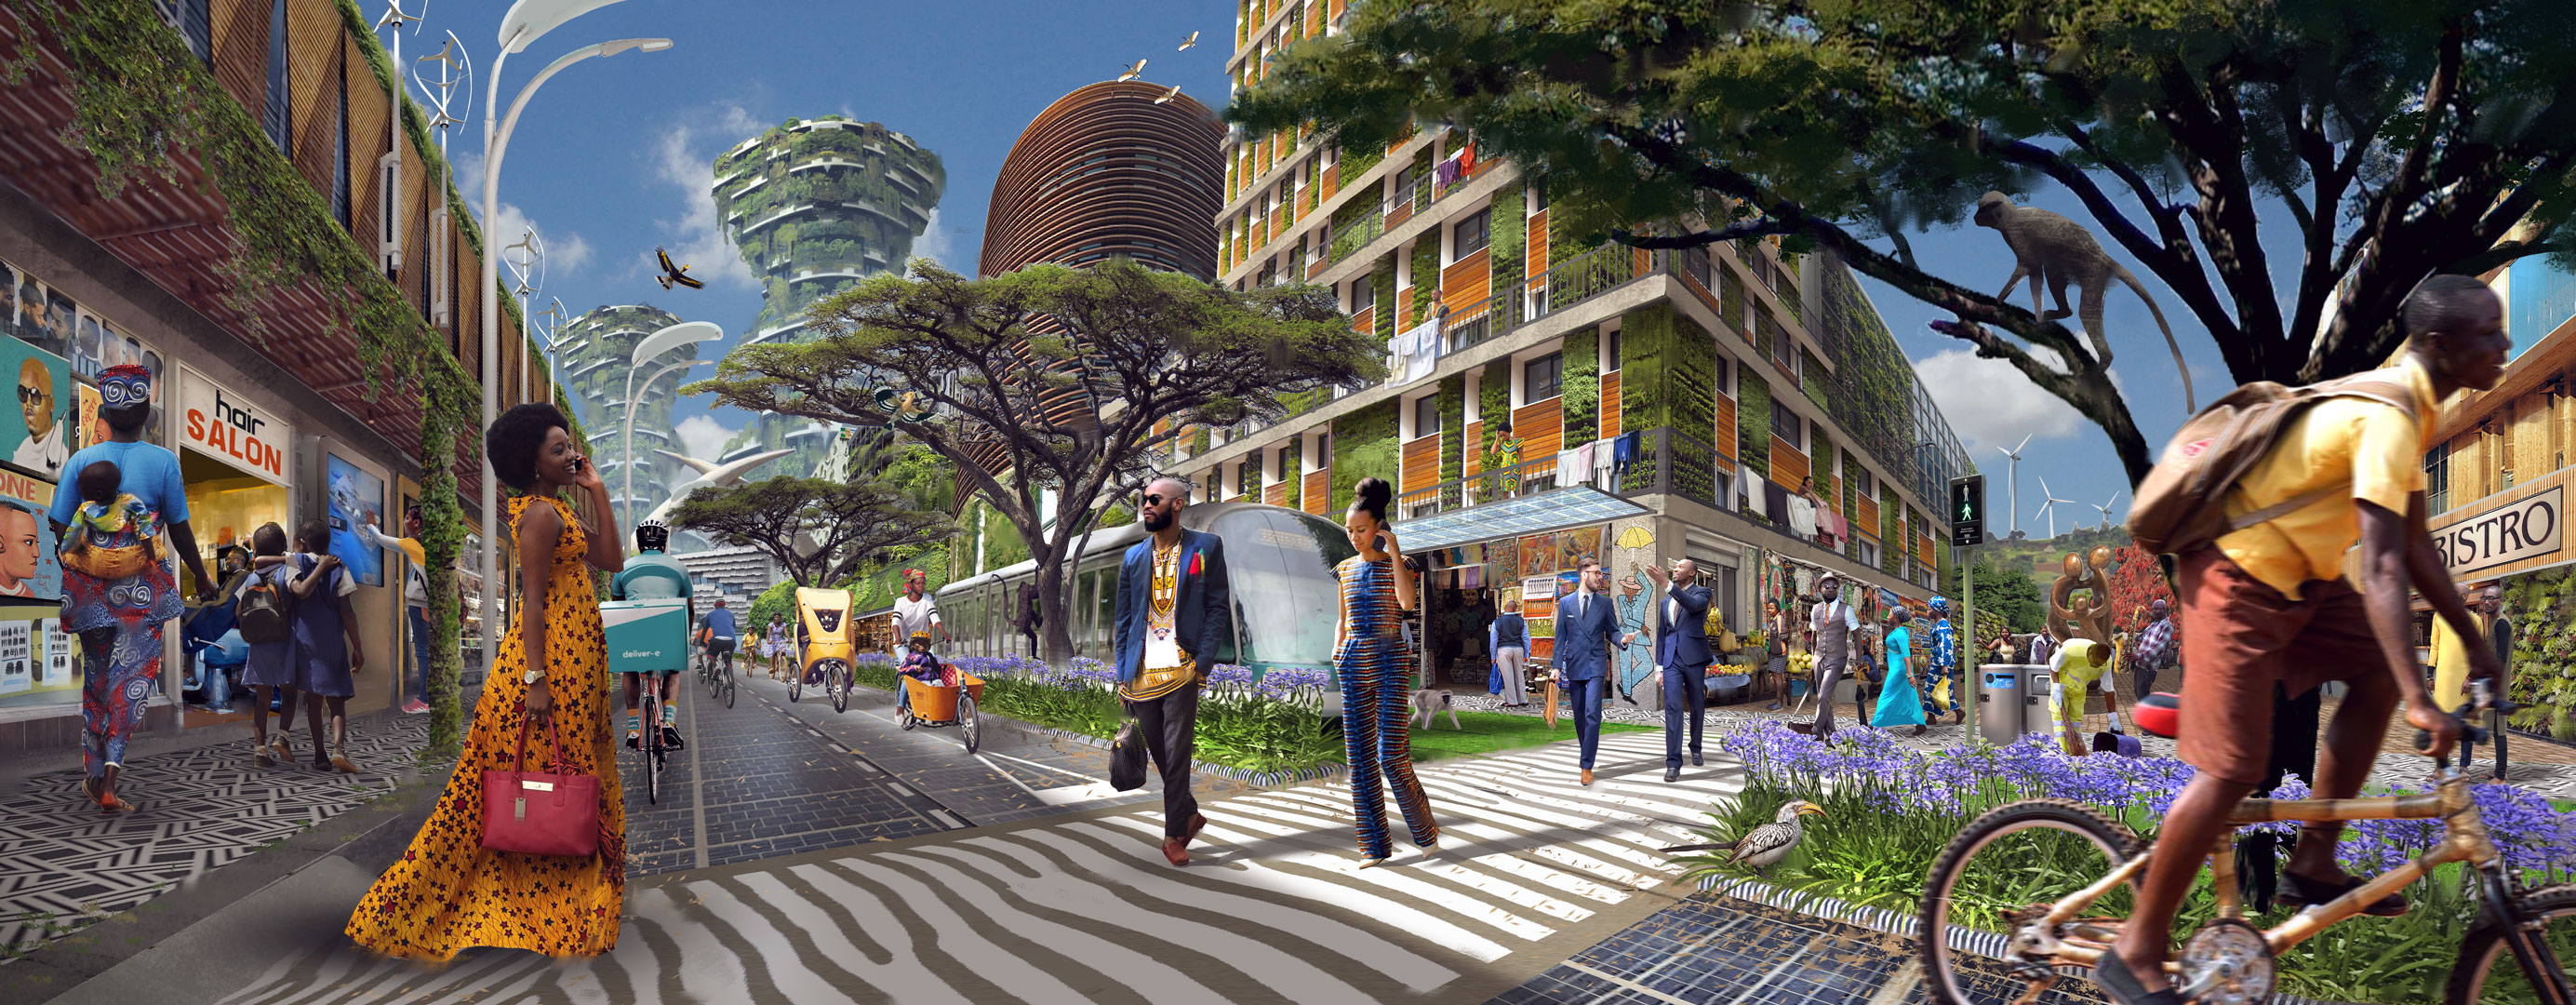 Afrikaanse alternatieven Post-Fossil City Contest